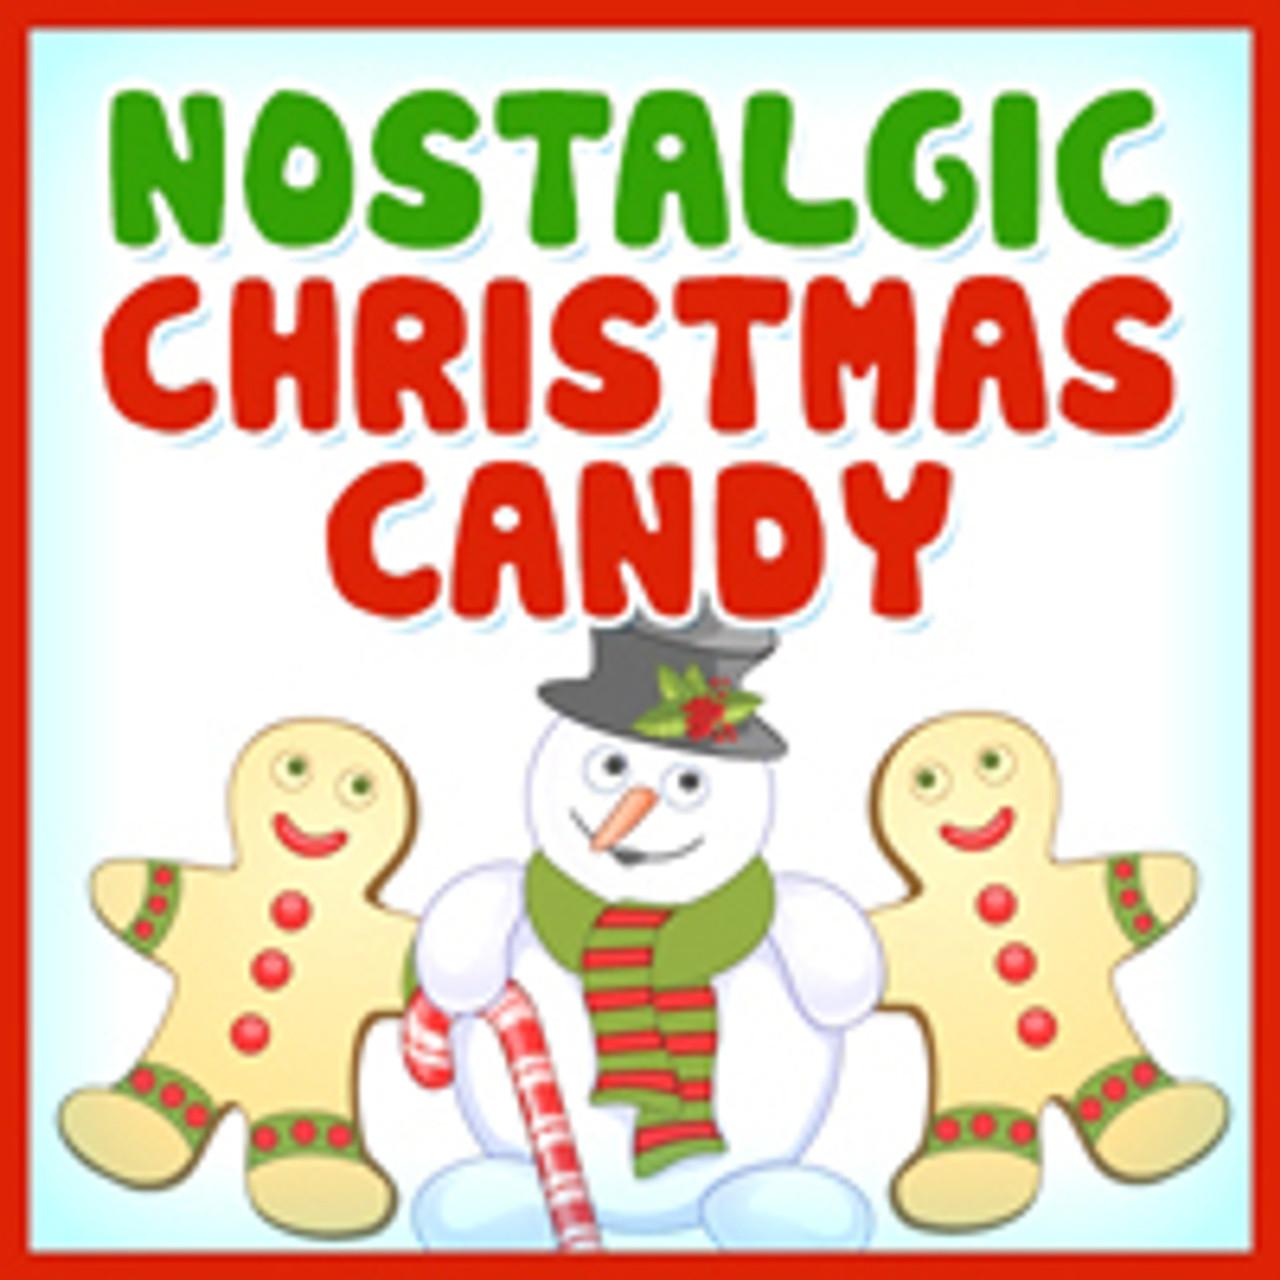 Nostalgic Christmas Candy Selections